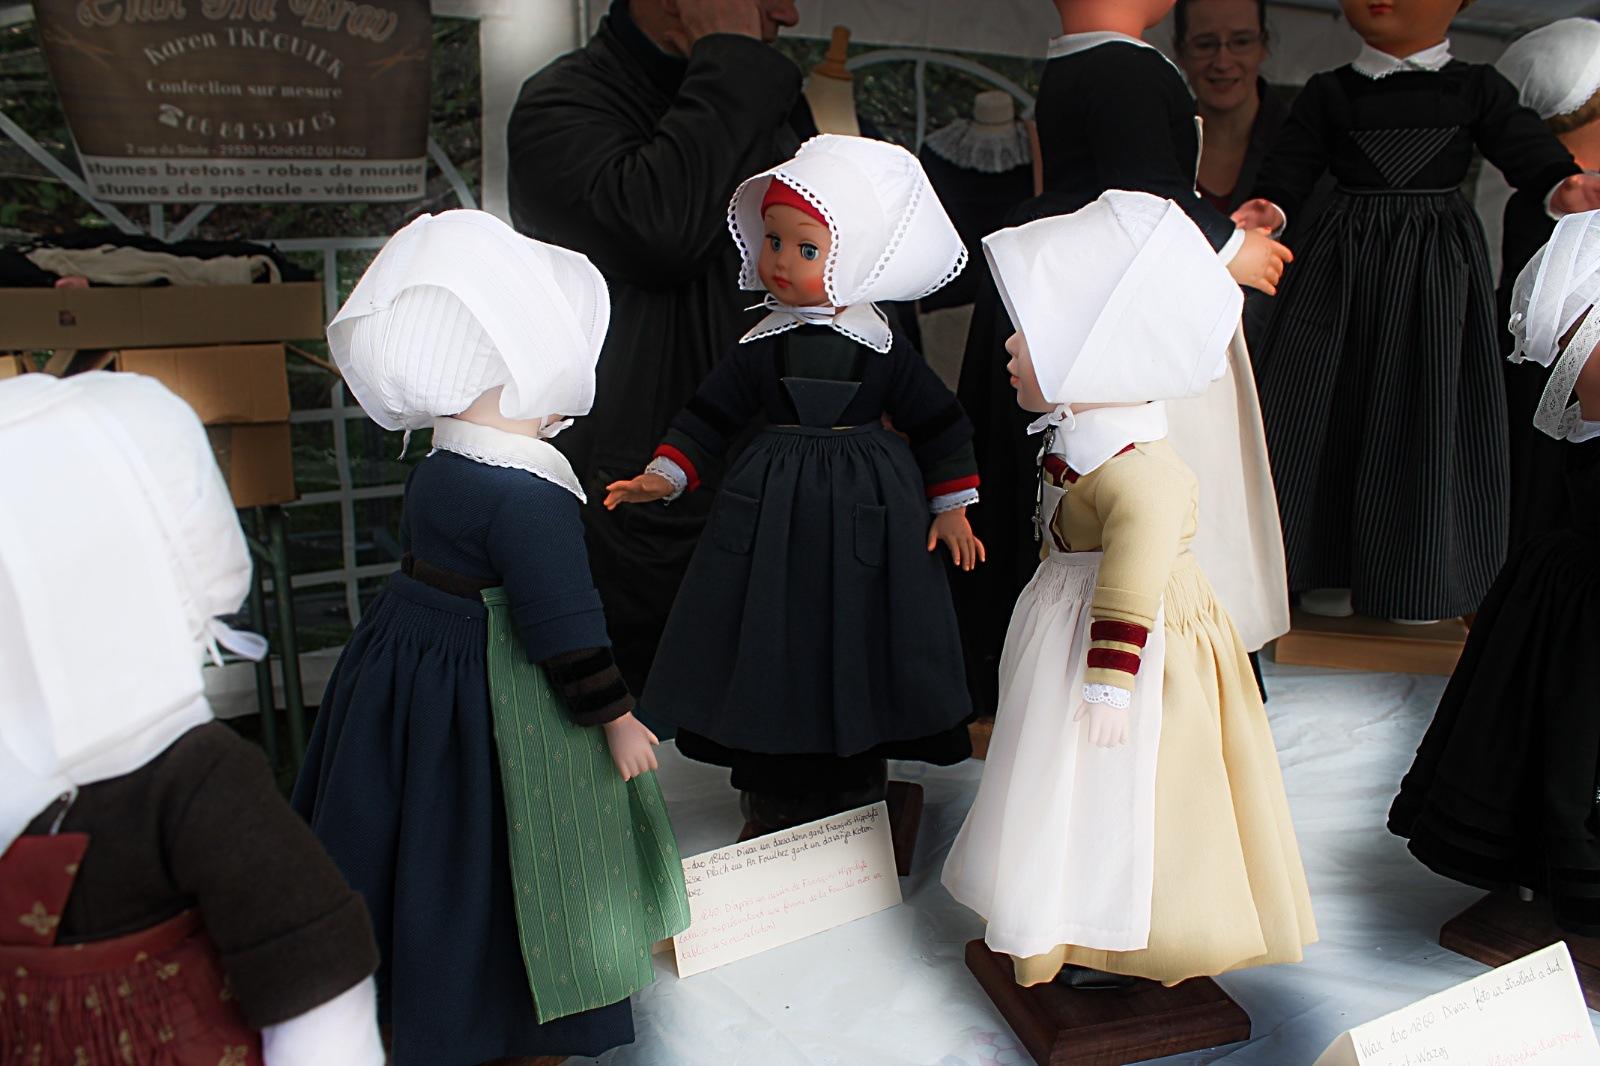 Doll's in Breton costume by Rob Helliker